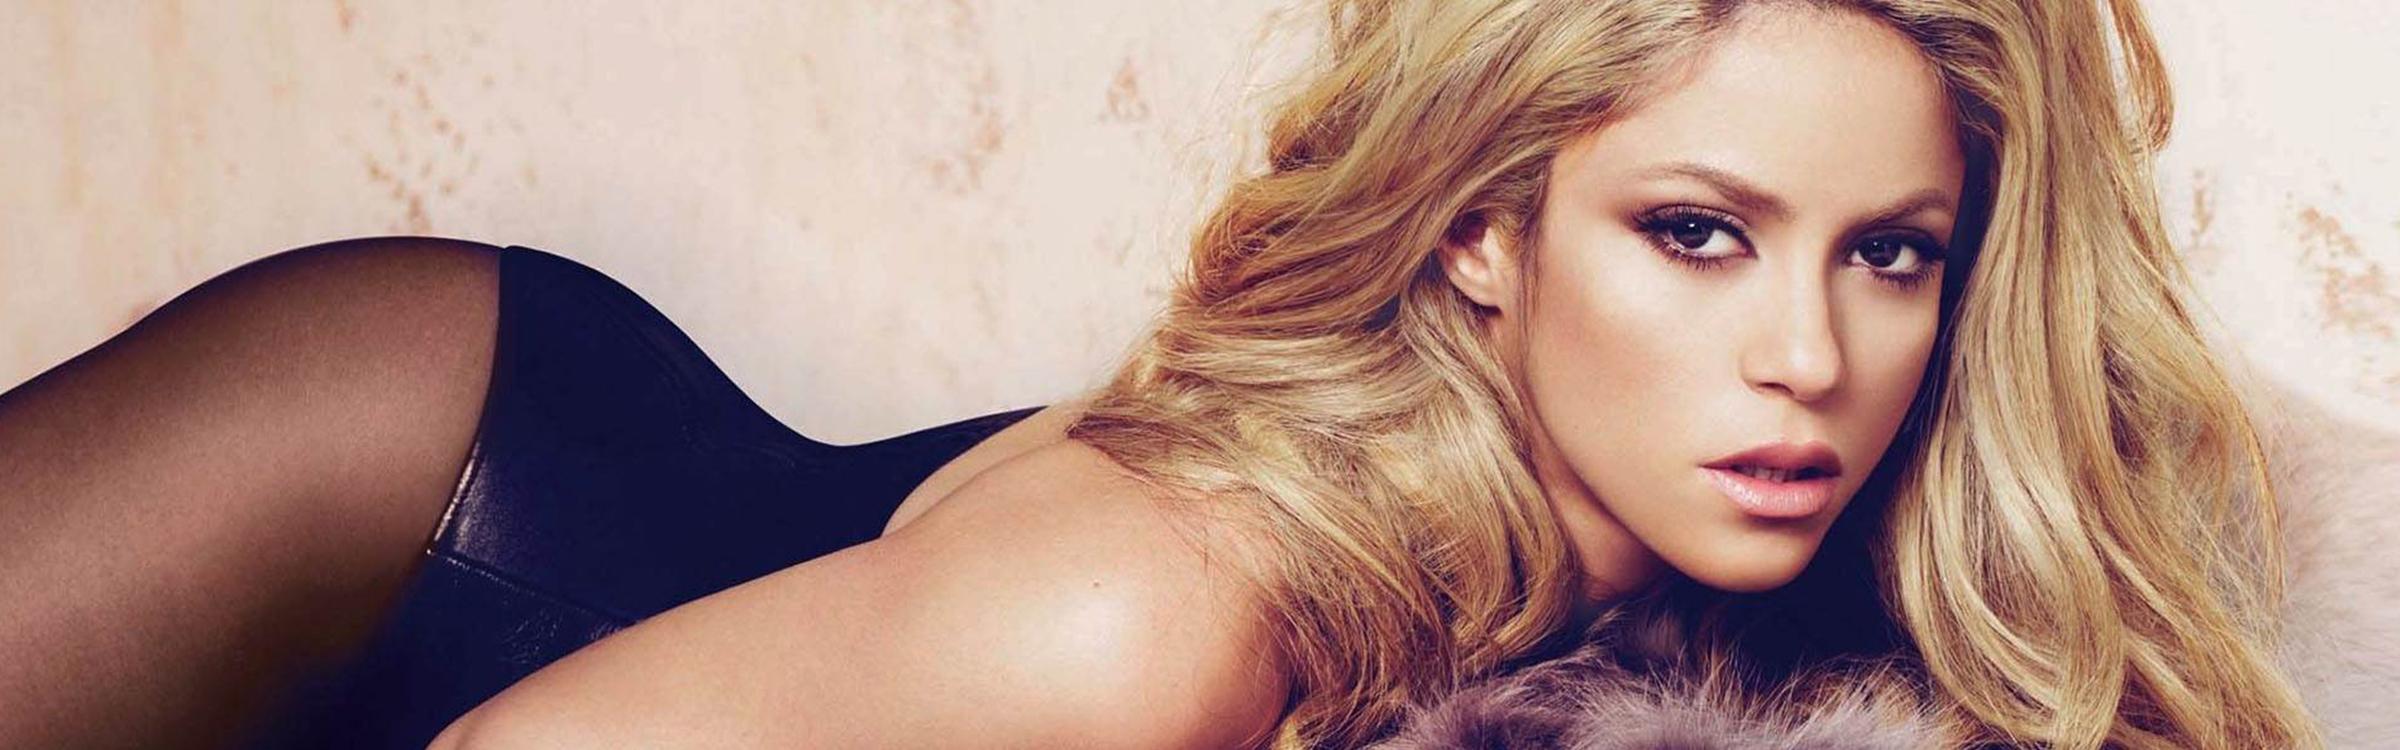 Shakiraheader